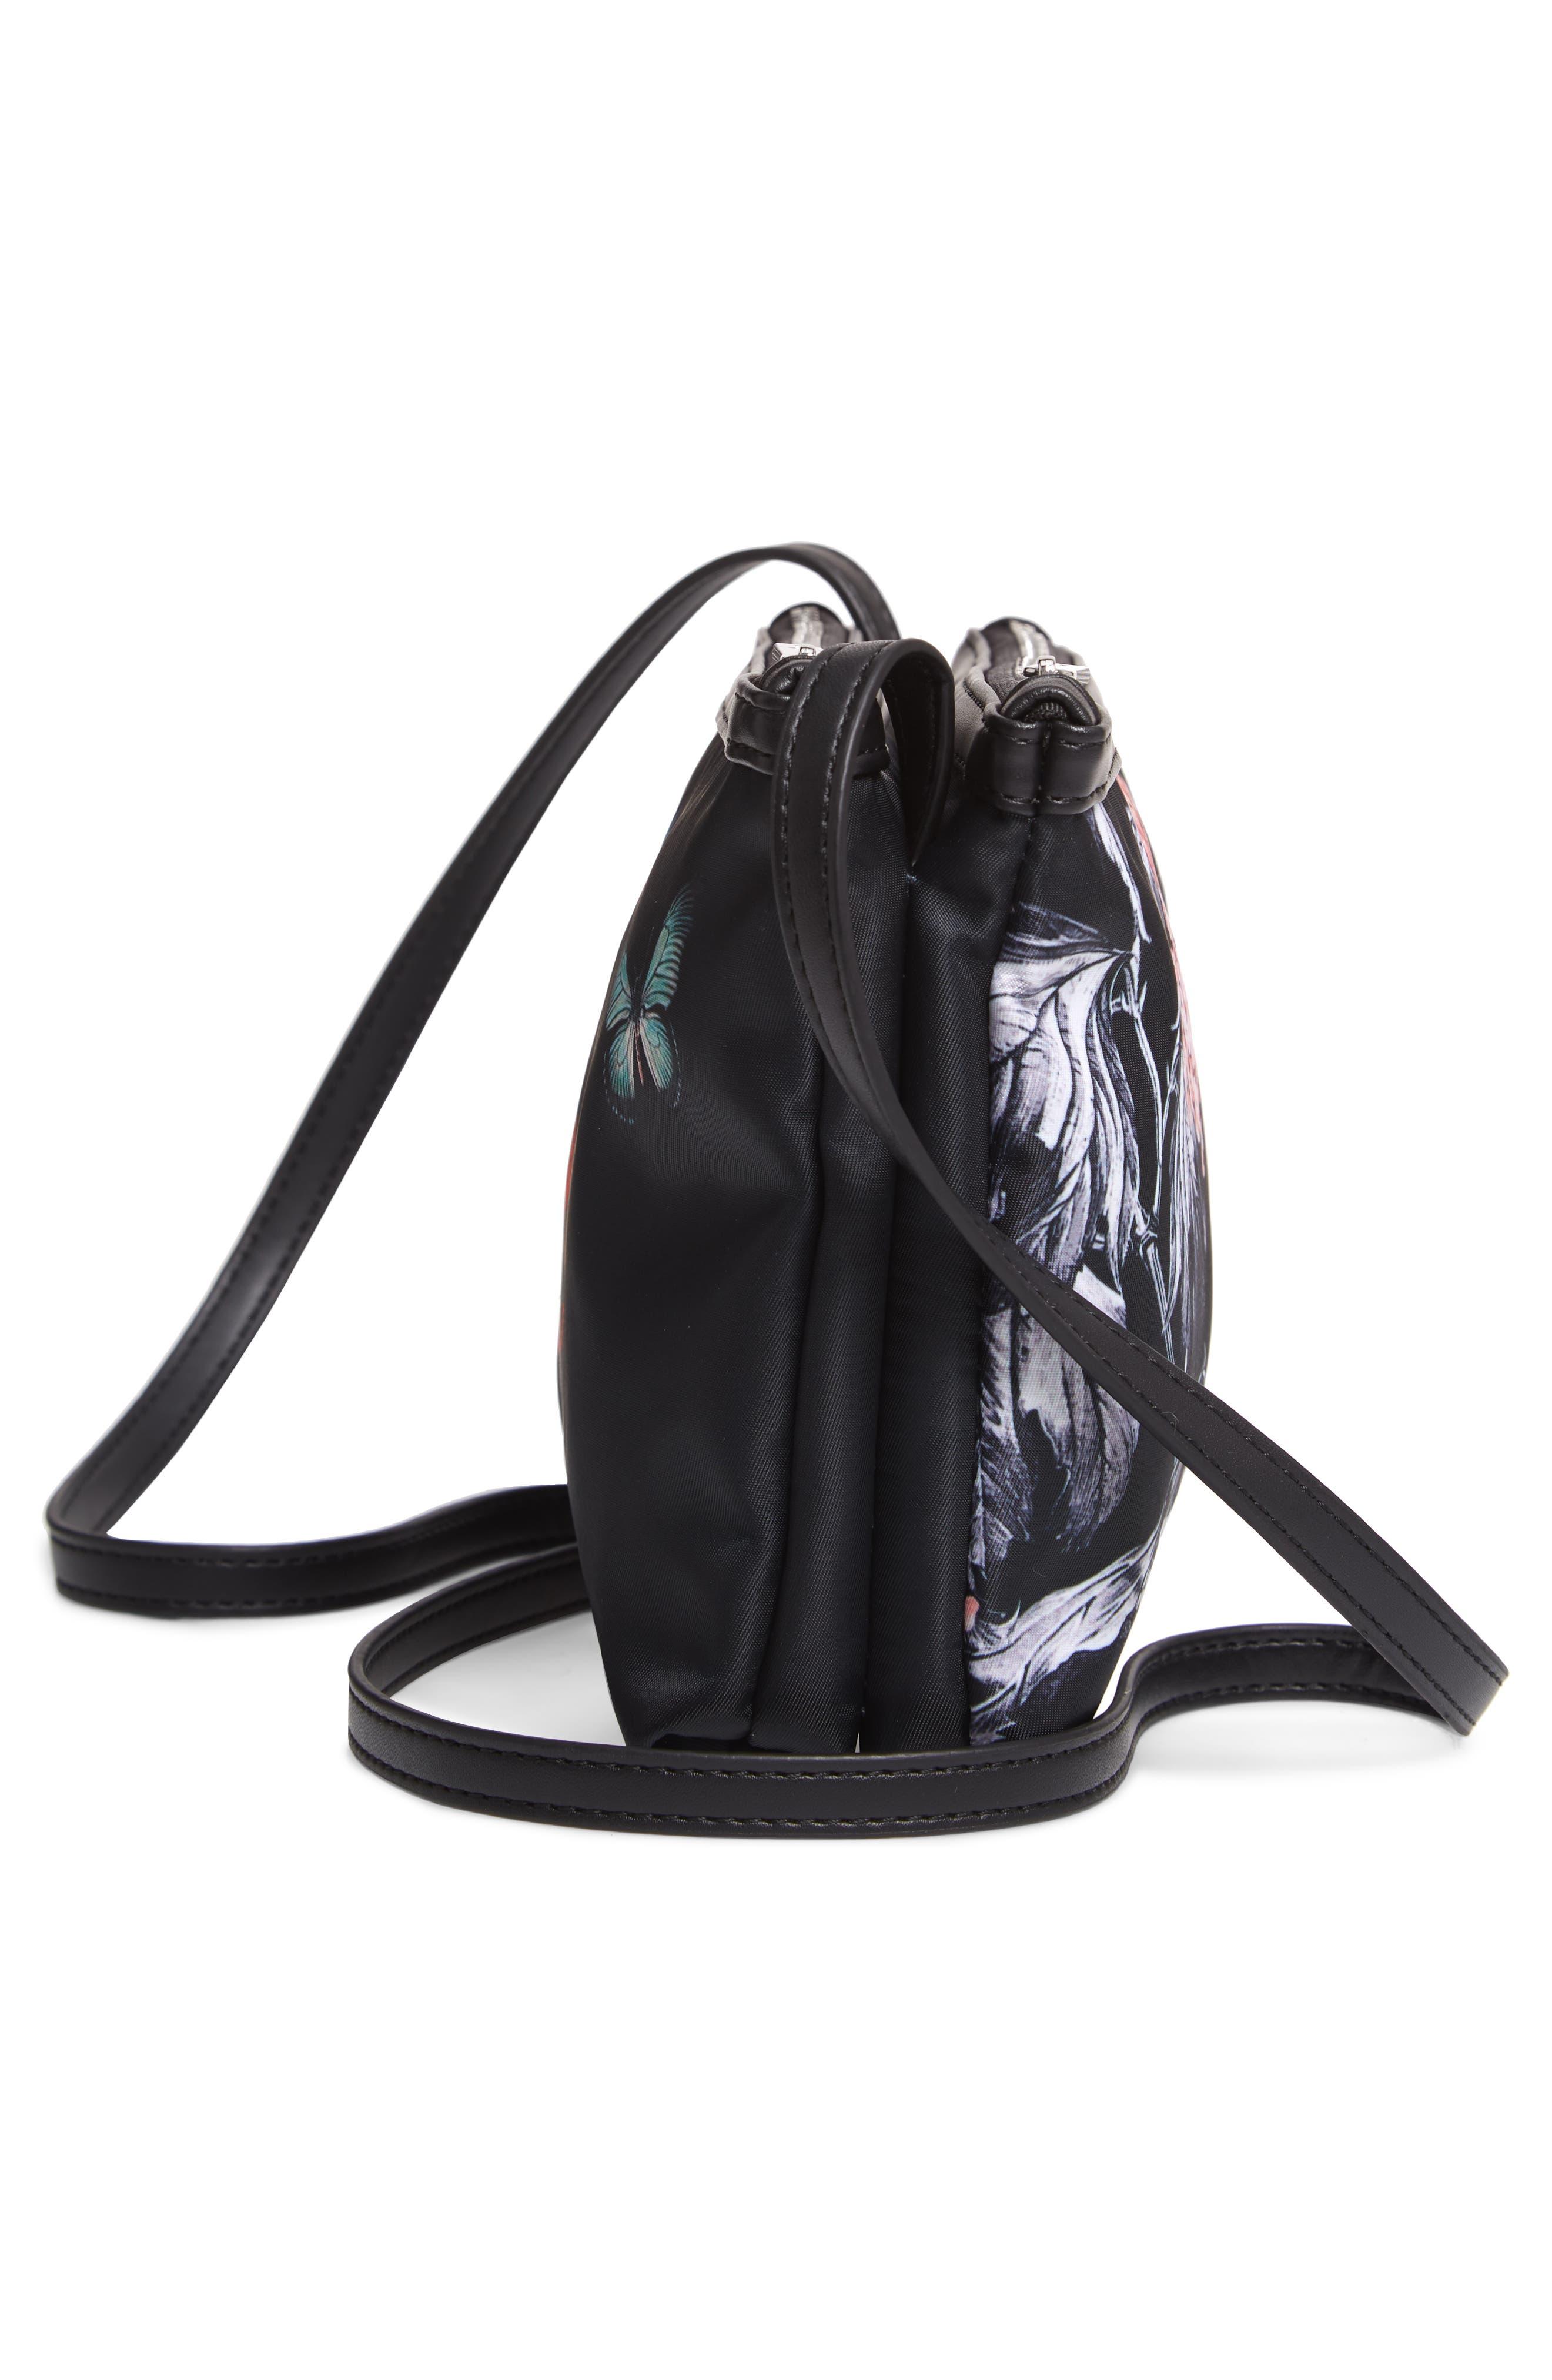 Myyaa Narrnia Nylon Crossbody Bag,                             Alternate thumbnail 5, color,                             BLACK